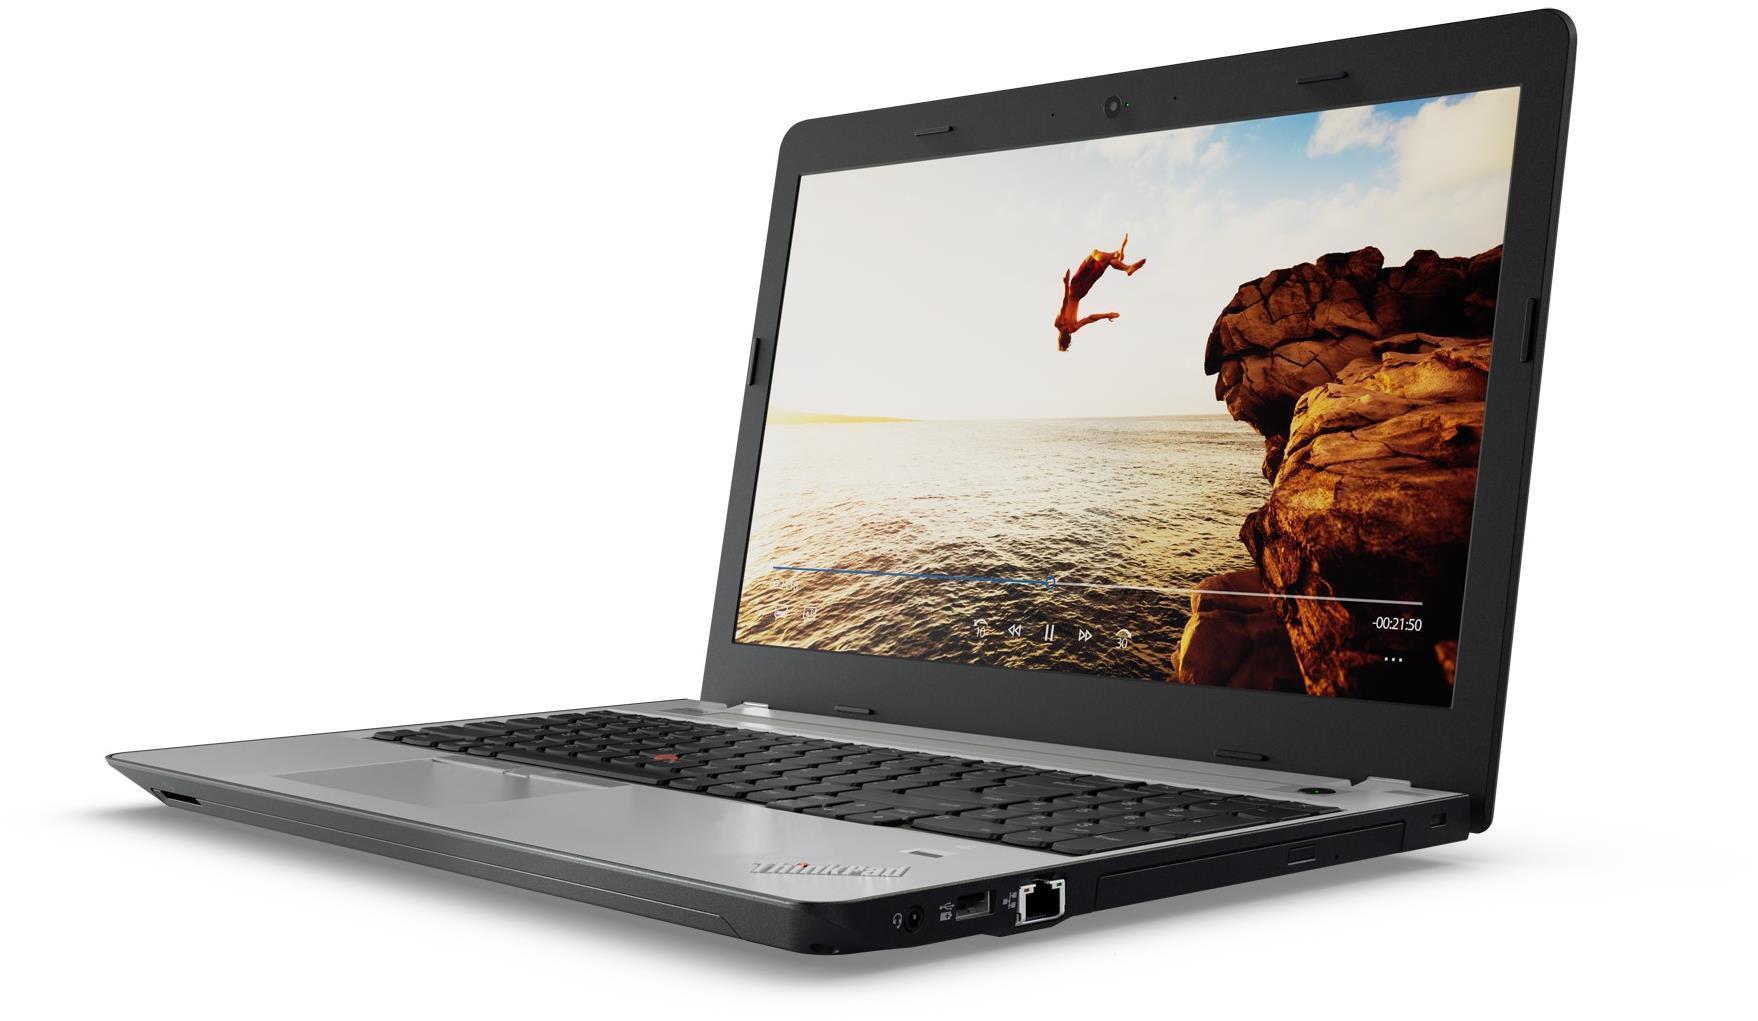 "Lenovo ThinkPad E570 i5-7200U/8GB/1TB-5400/DVD±RW/HD Graphics 620/15,6""FHD IPS matný/Win10 černo-stříbrný"